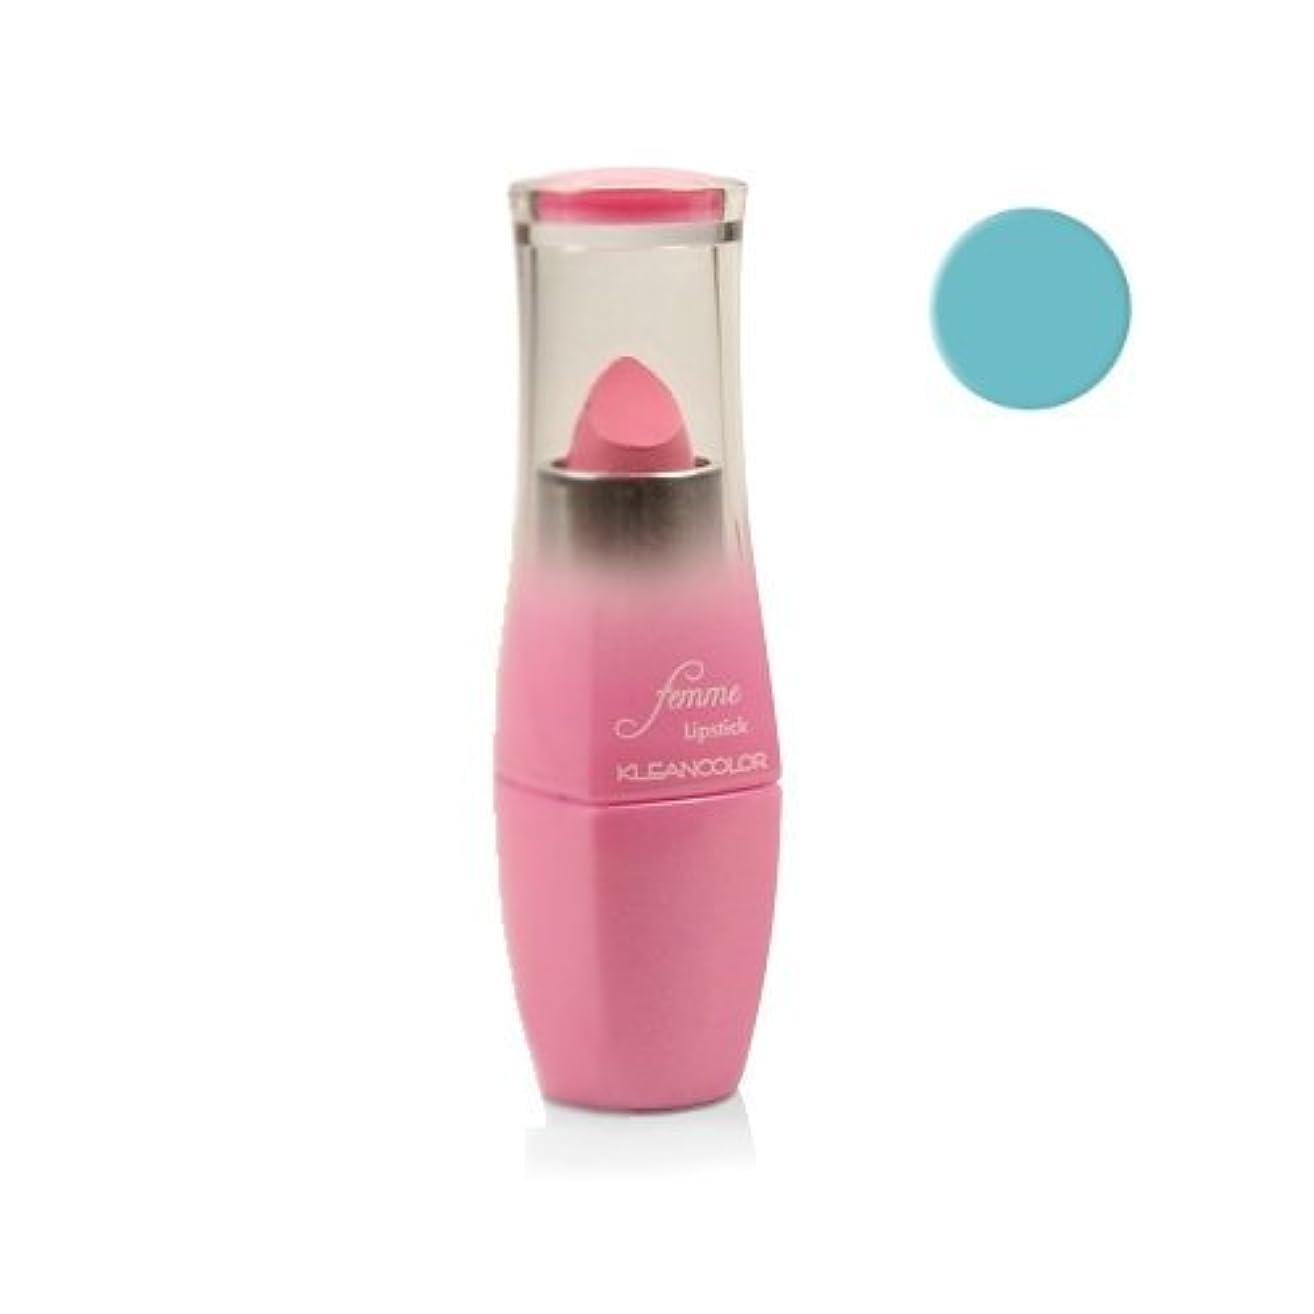 円周伝導野球KLEANCOLOR Femme Lipstick - Jewelry Box (並行輸入品)